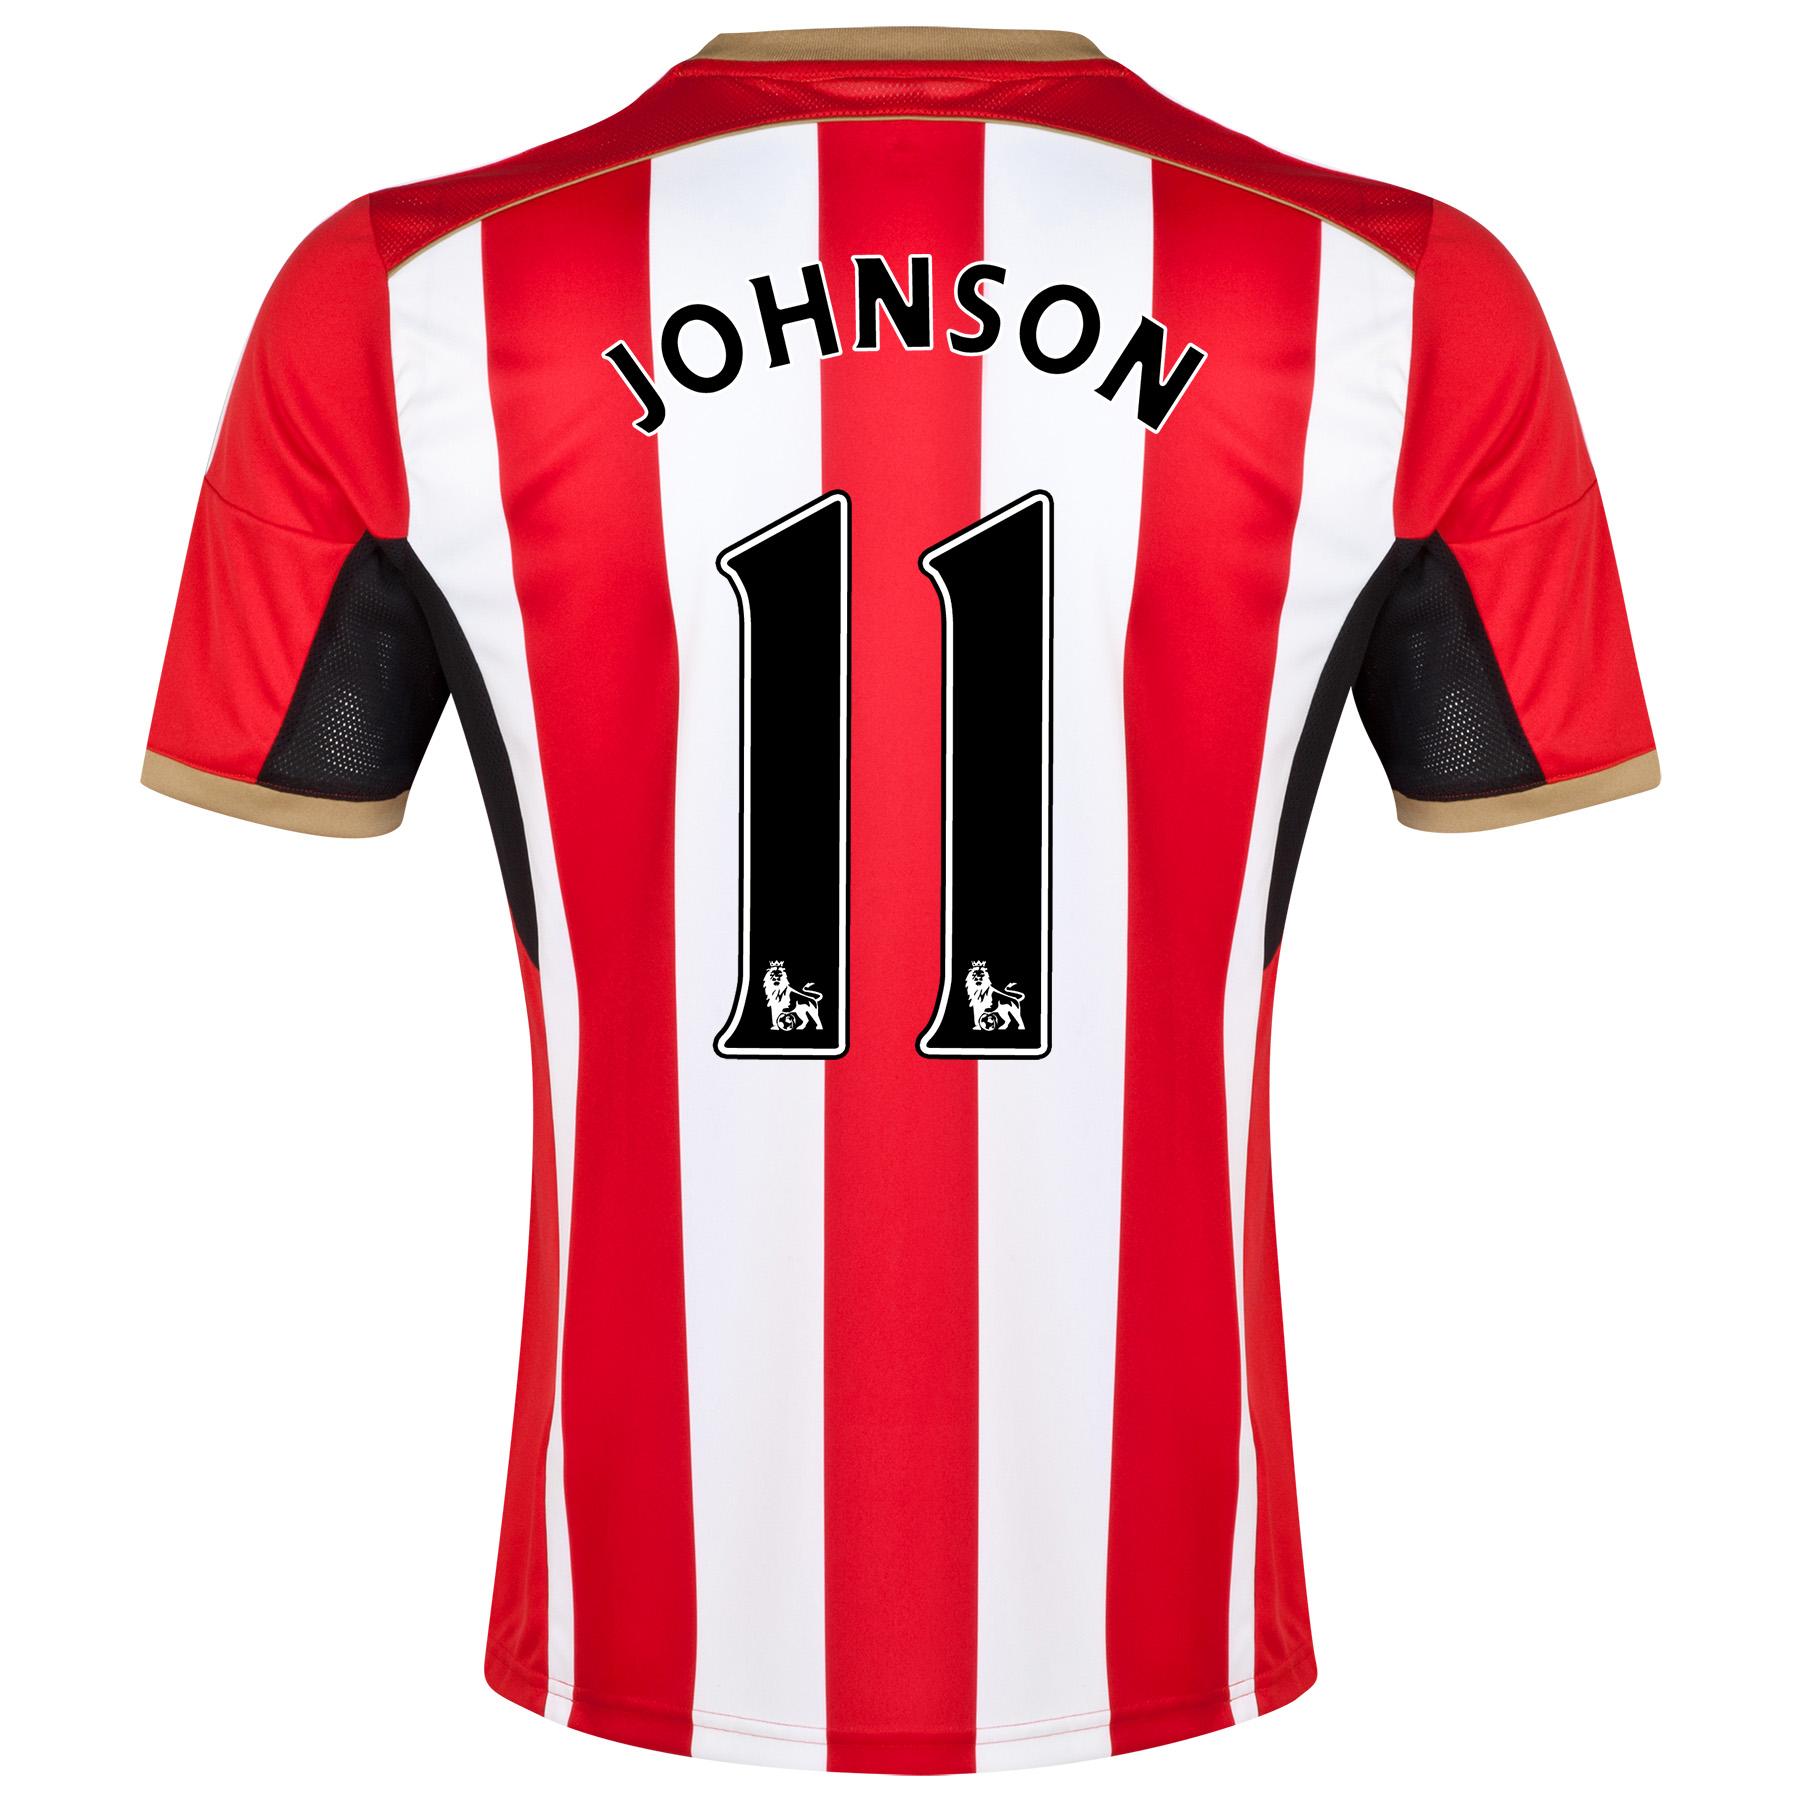 Sunderland Home Shirt 2014/15 - Junior Red with Johnson 11 printing